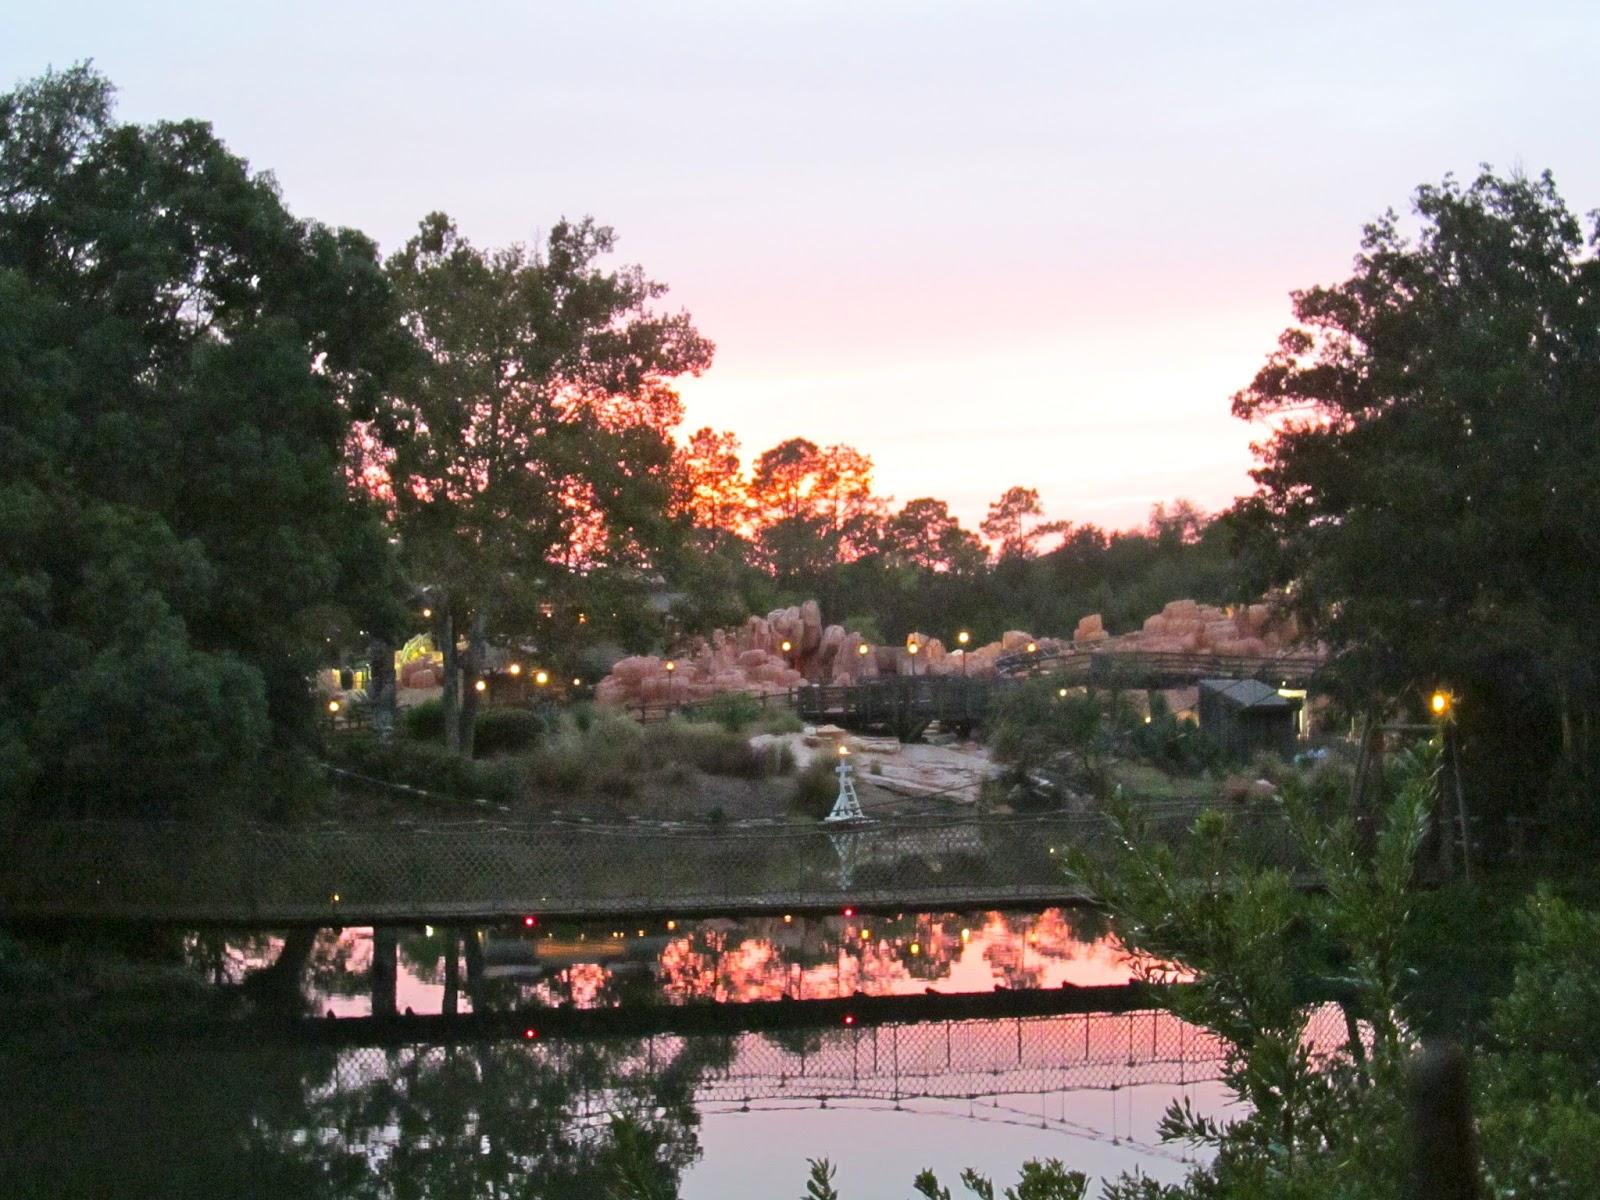 Sunset at the Magic Kingdom, Orlando, FL - ouroutdoortravels.blogspot.com